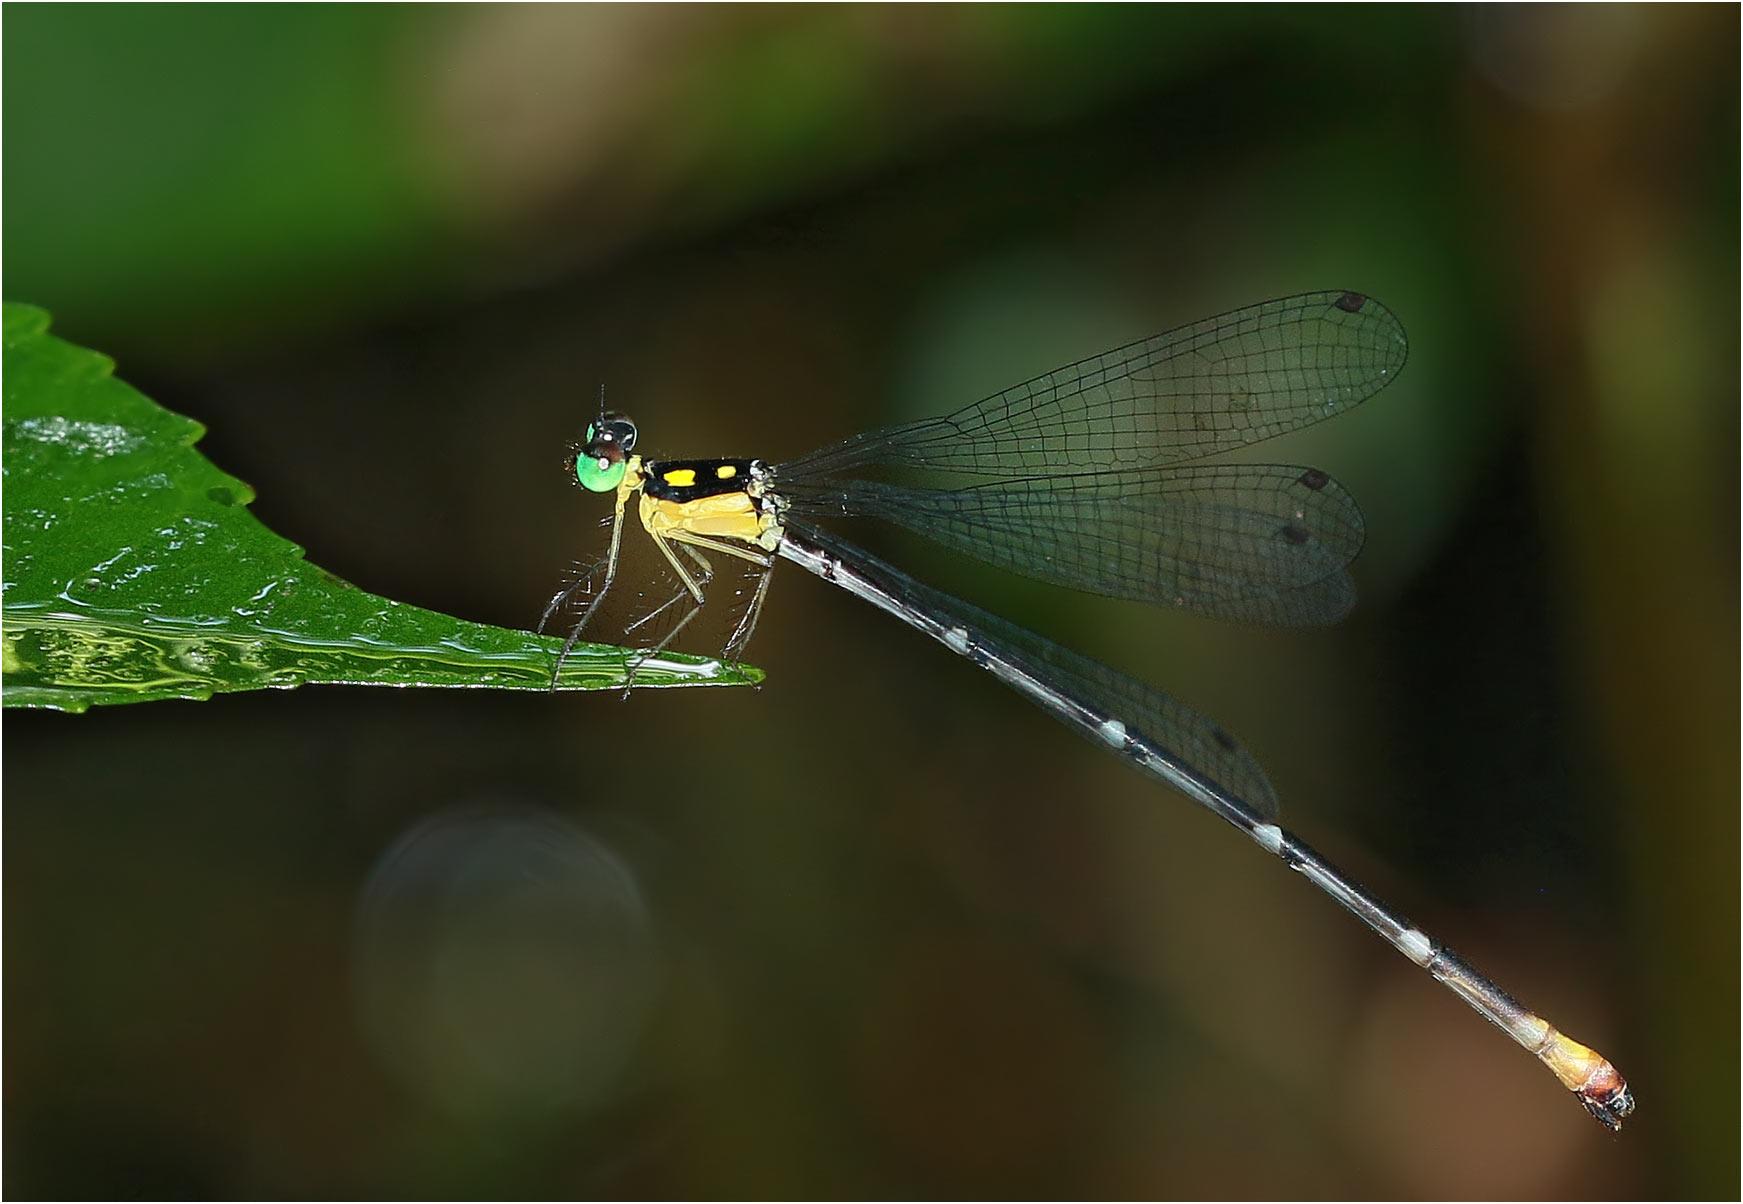 Coeliccia sp. nov. 'p' femelle, Vietnam, Huu Lien, 03/06/2018